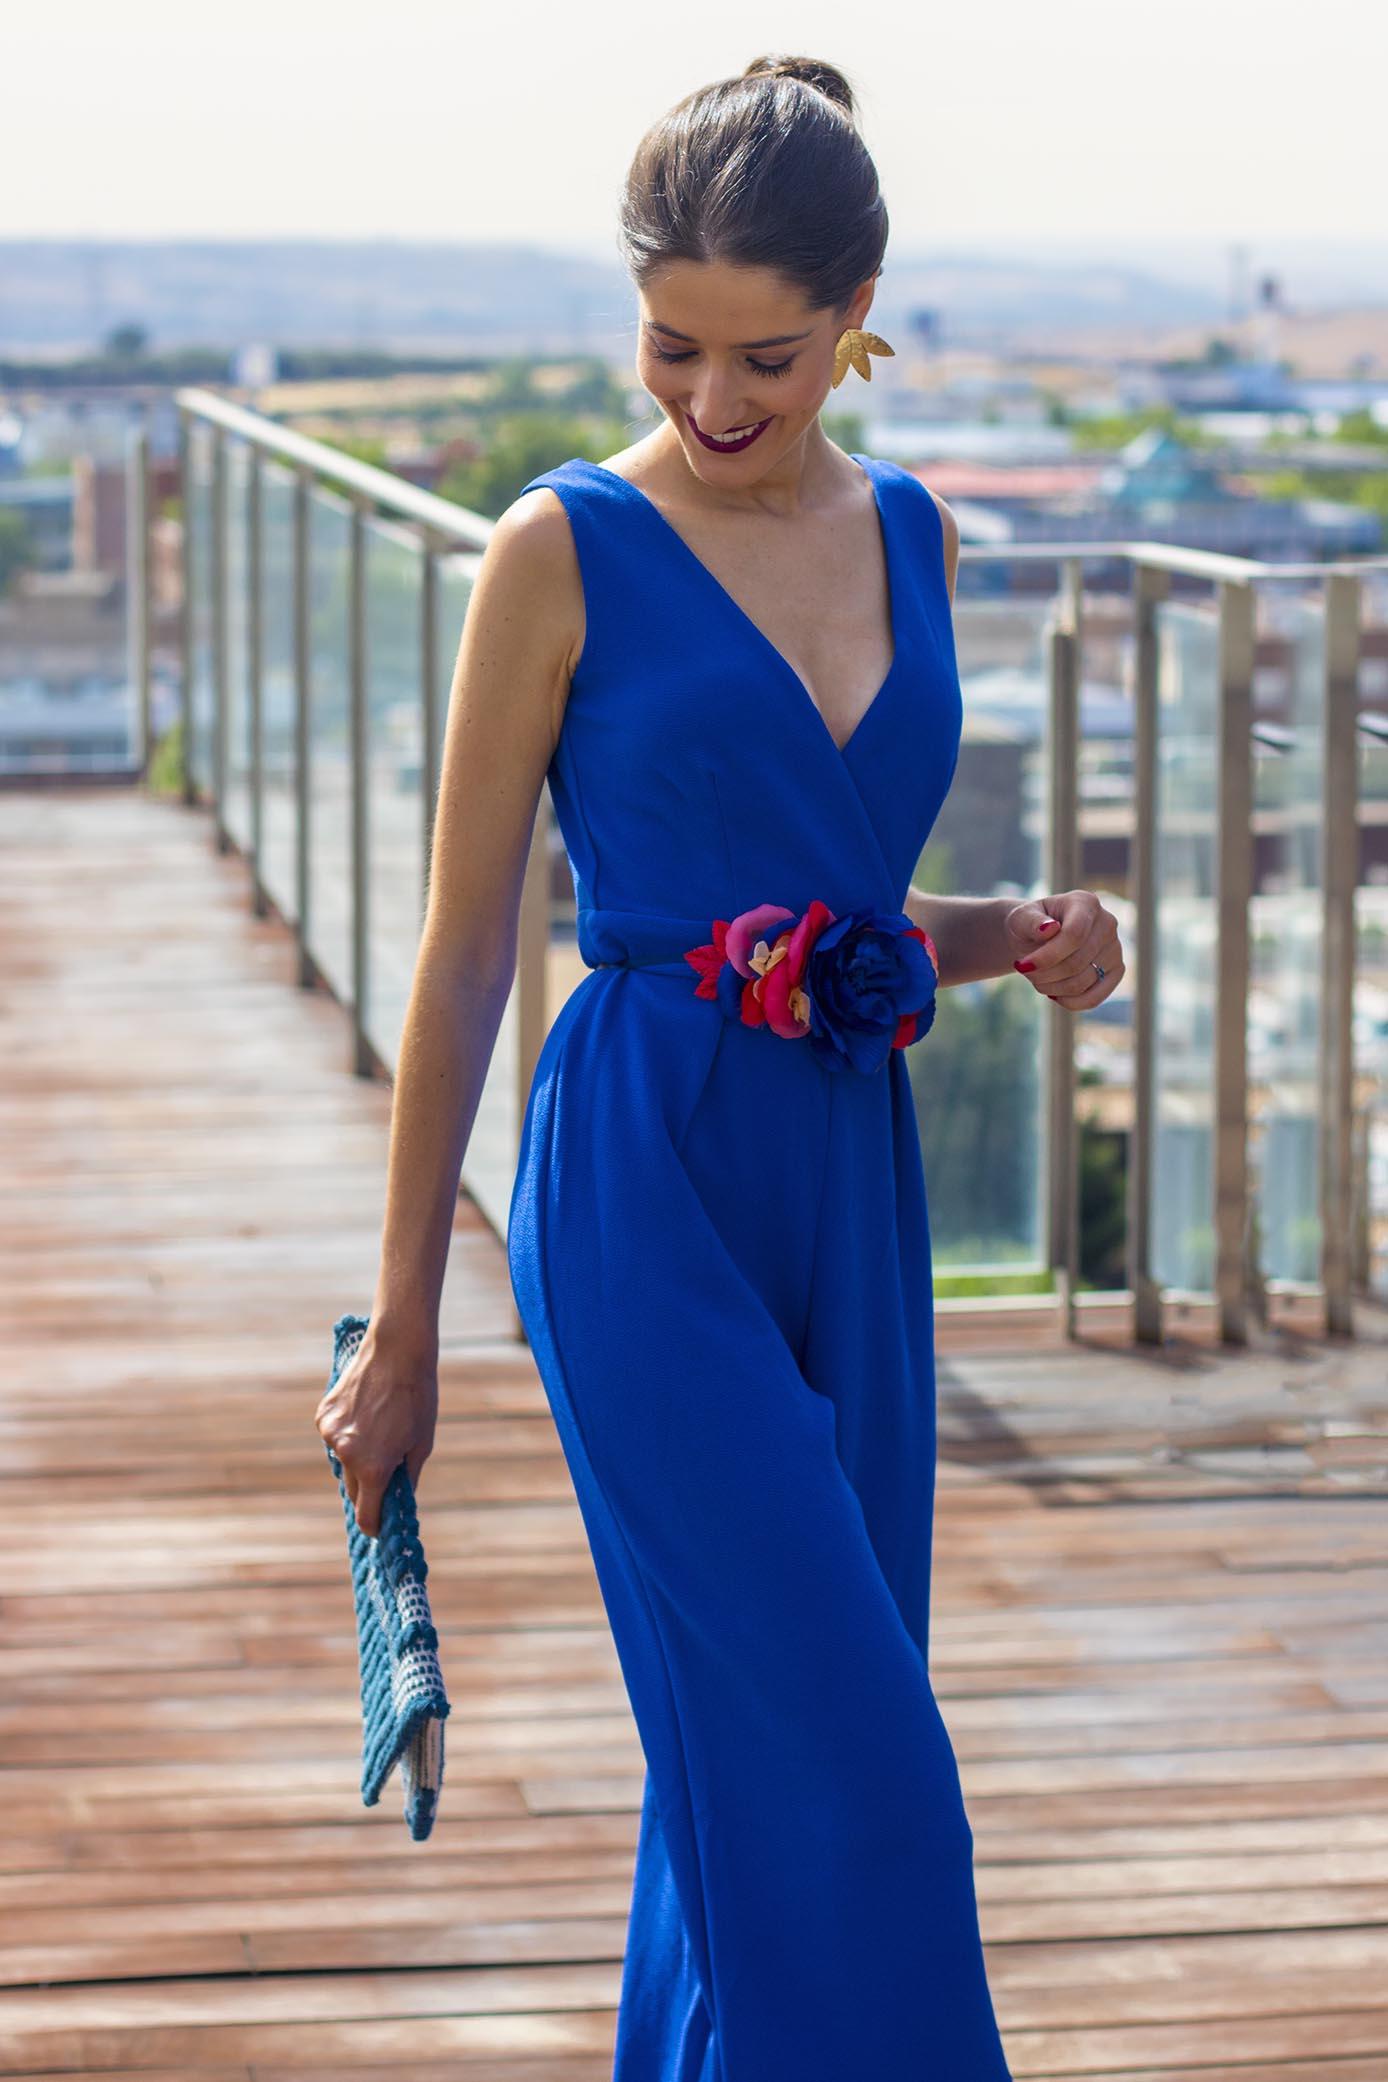 87339454a Invitada boda con mono azul con espalda de Wild Pony 3 – Invitada ...